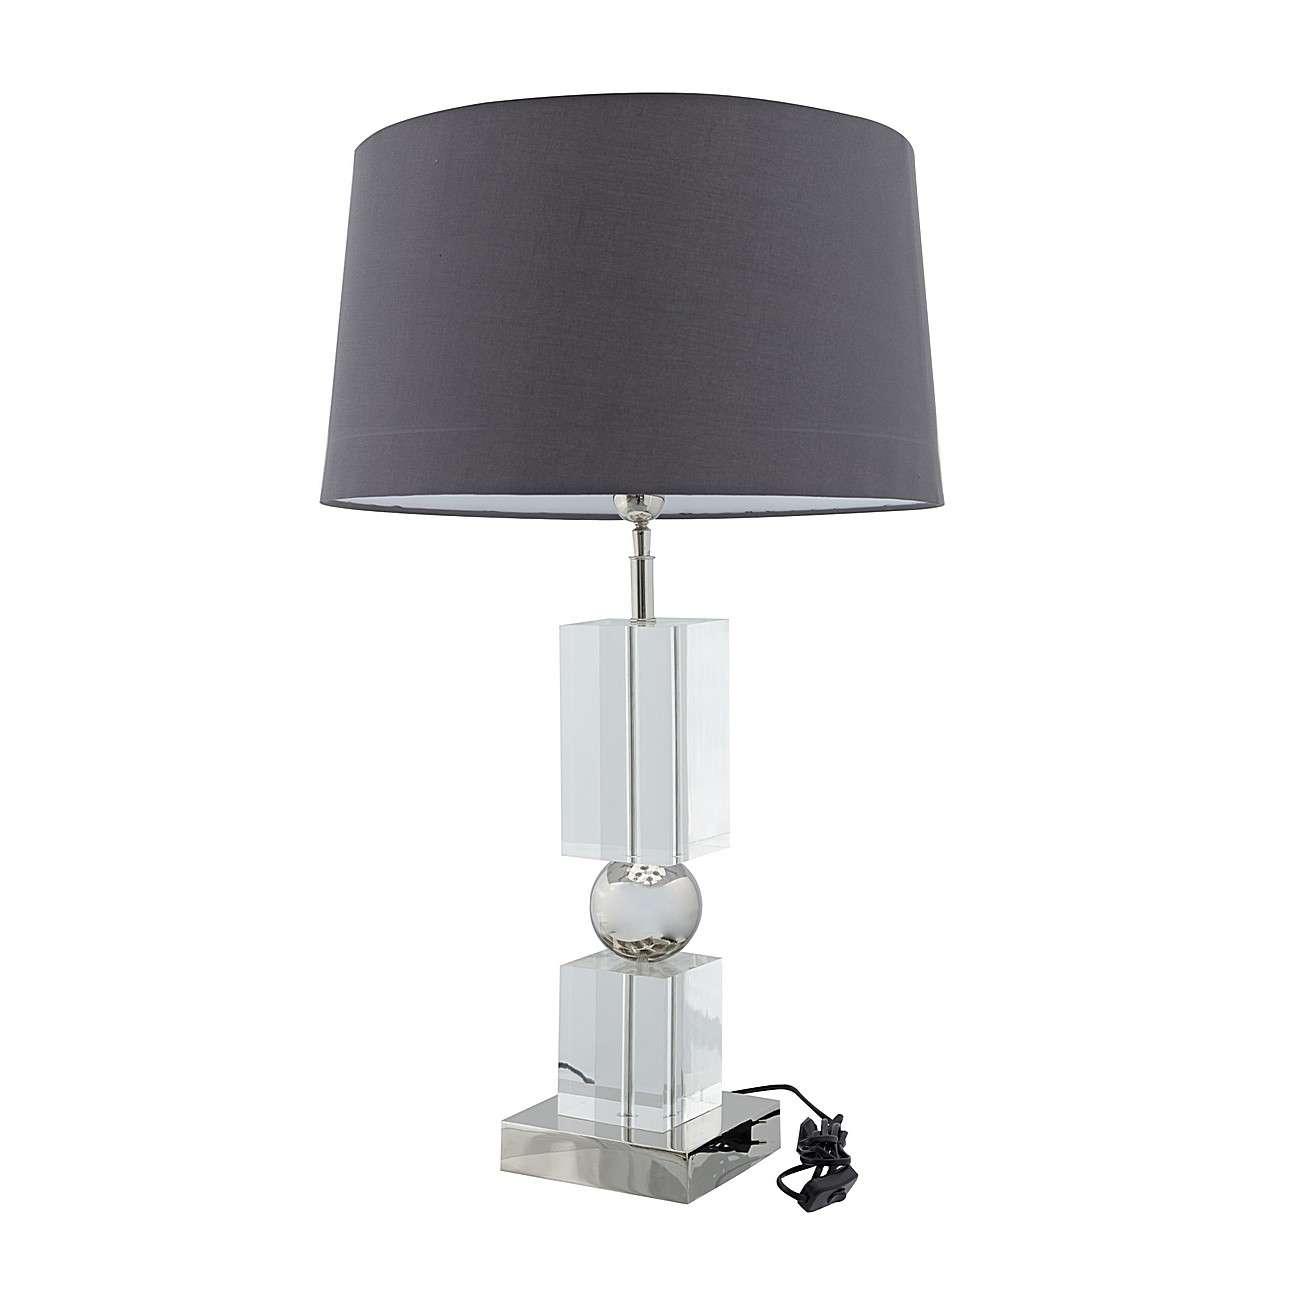 Tischlampe Alora 85 cm